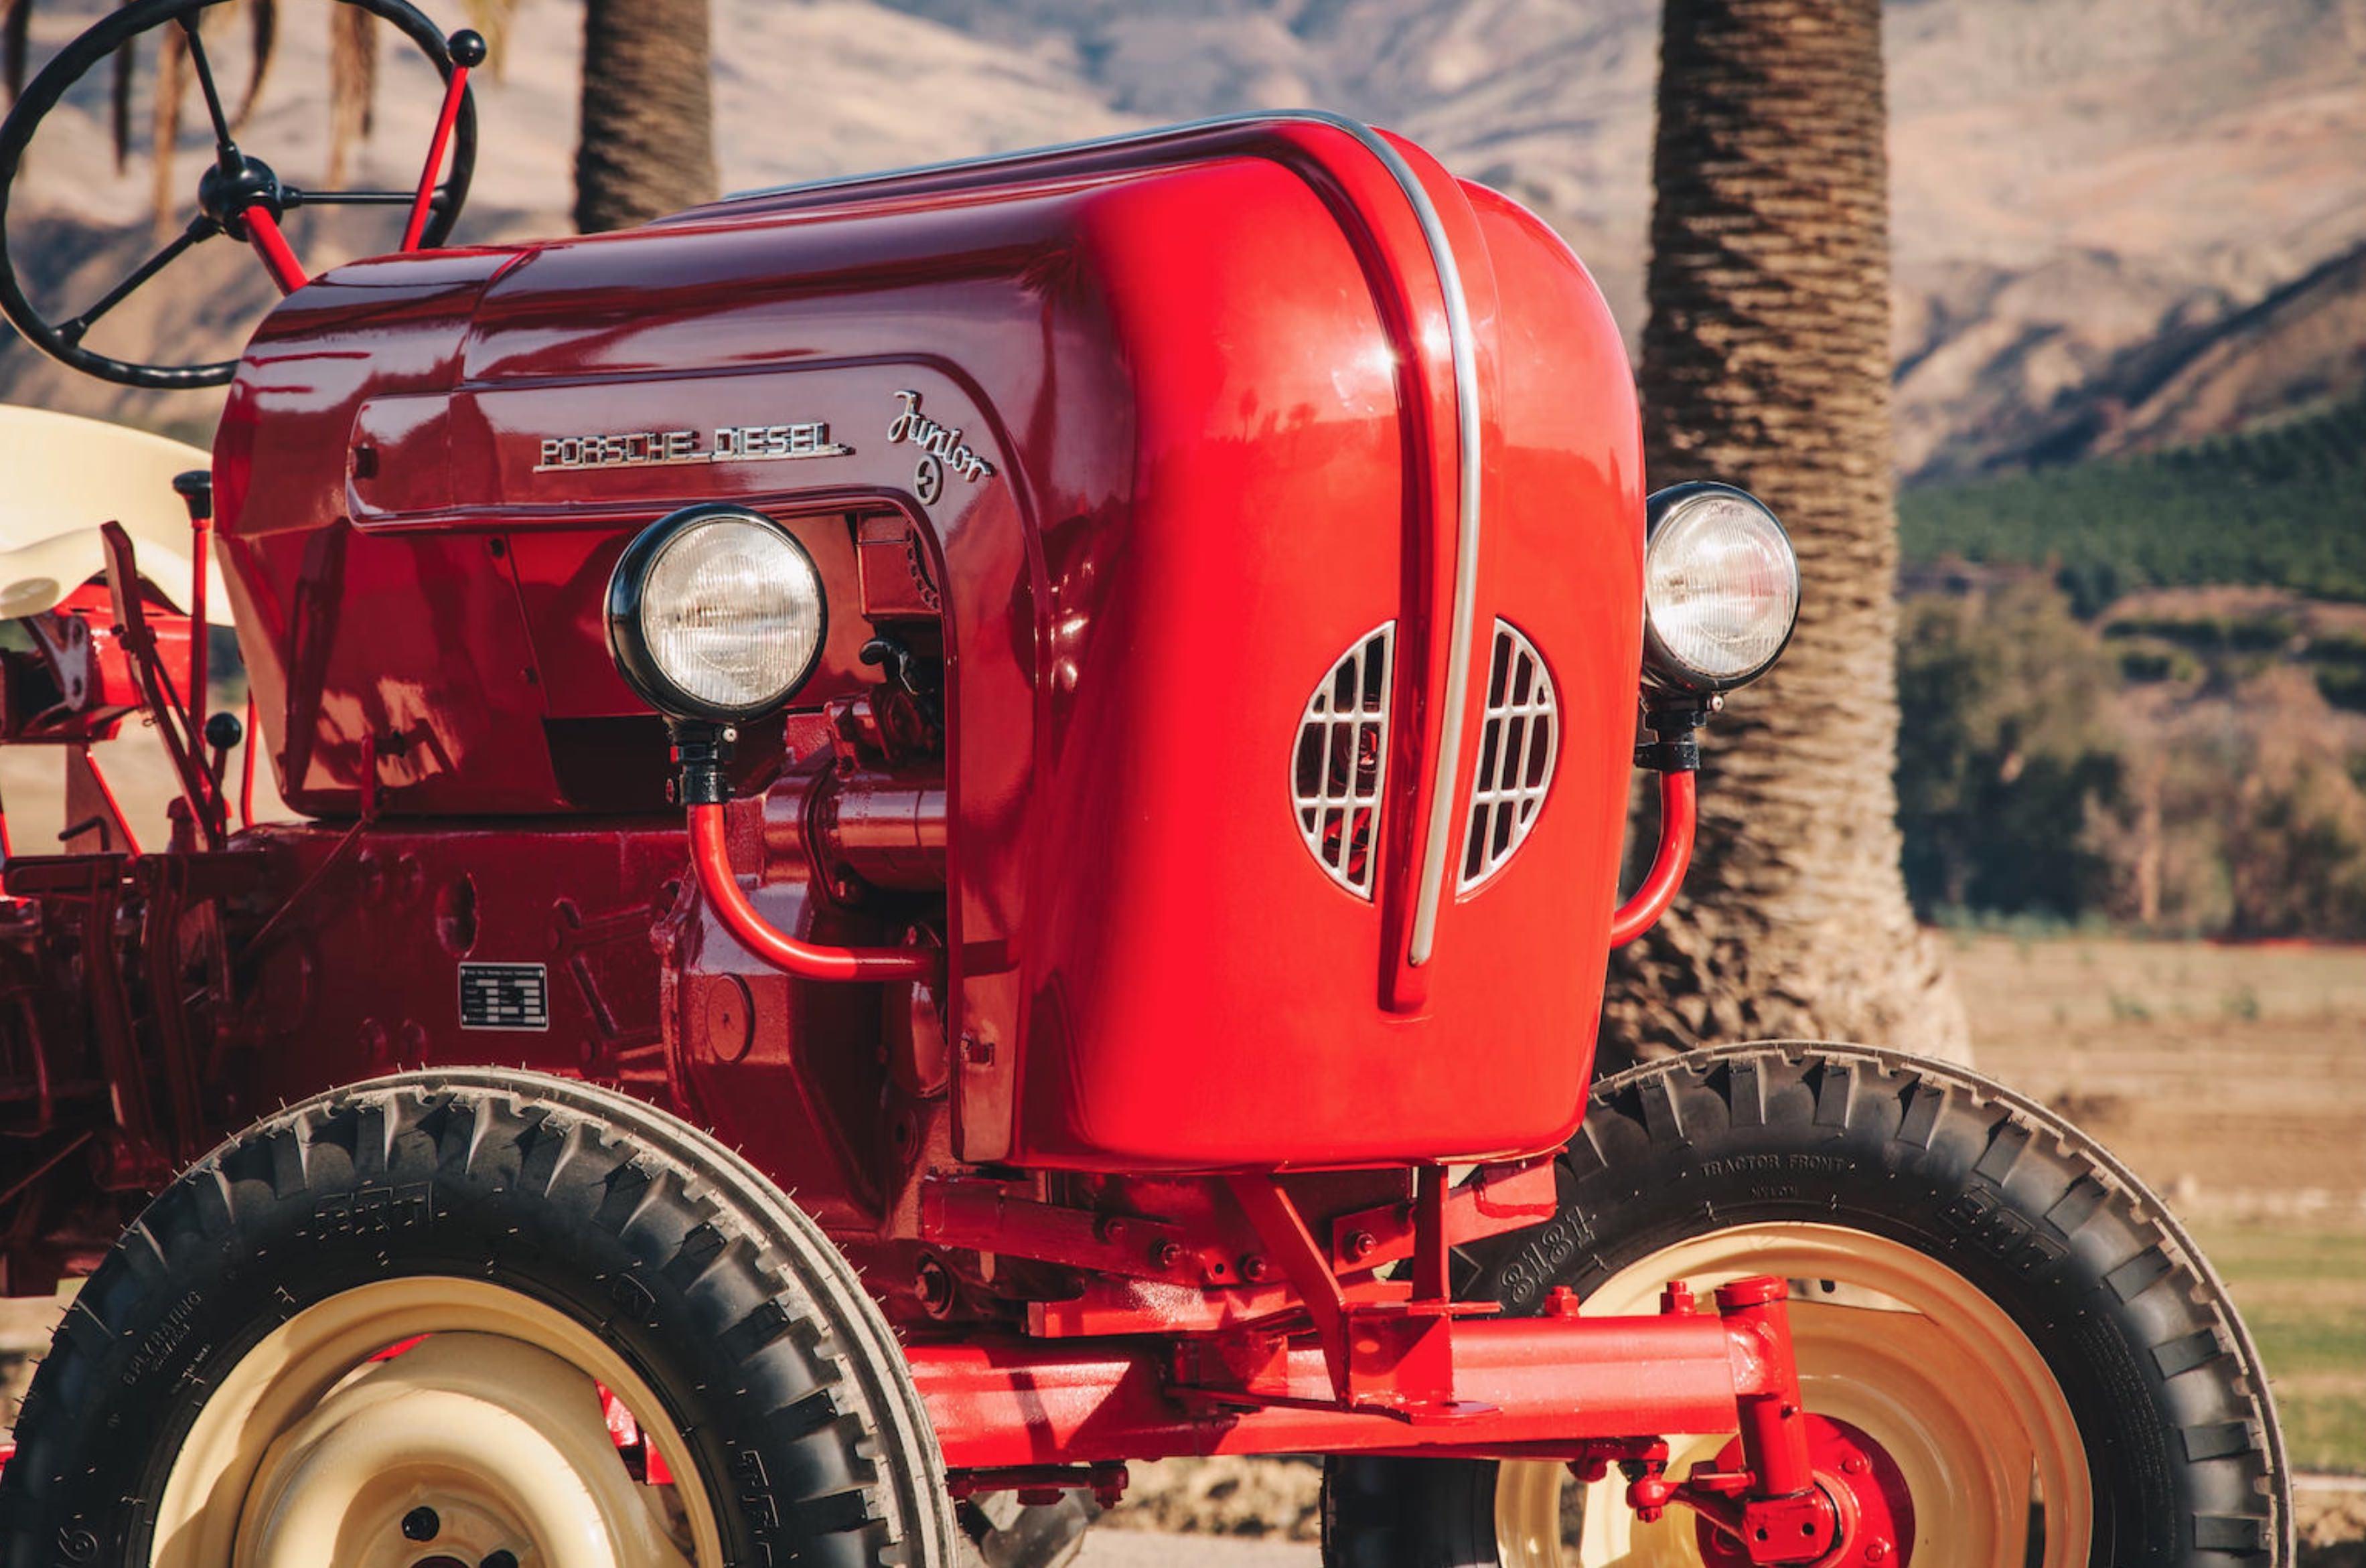 Porsche Tractor - A Rare, Restored 1961 Porsche Junior 108